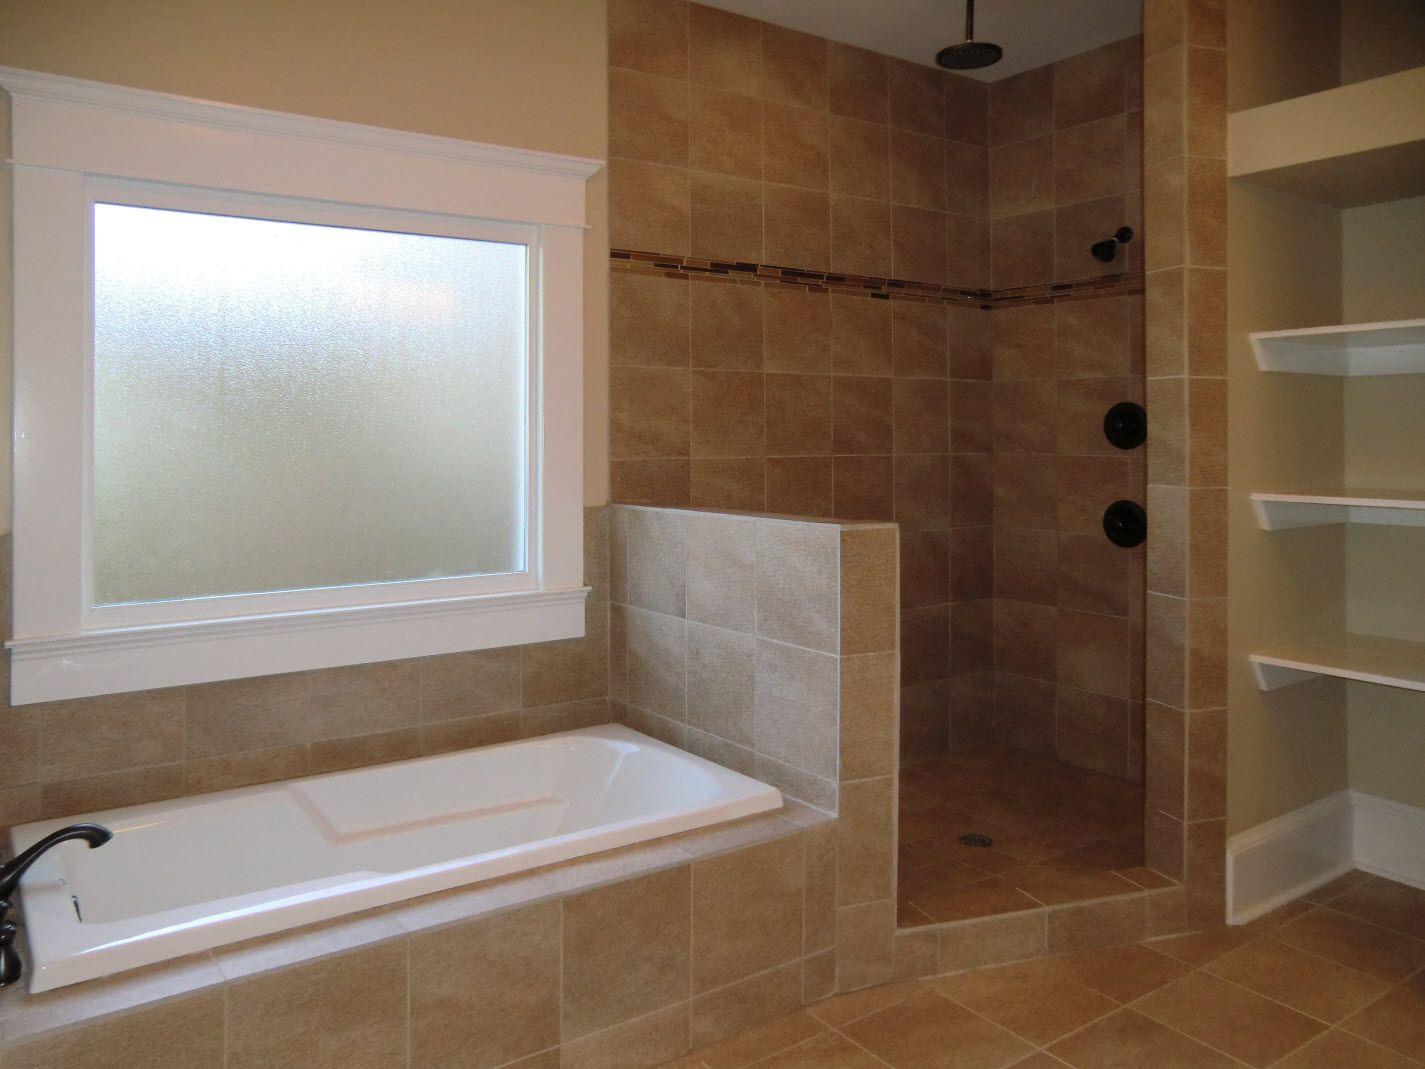 East Lake Drive Vision Pointe Homes Shower Tub Bathroom Design Bathrooms Remodel